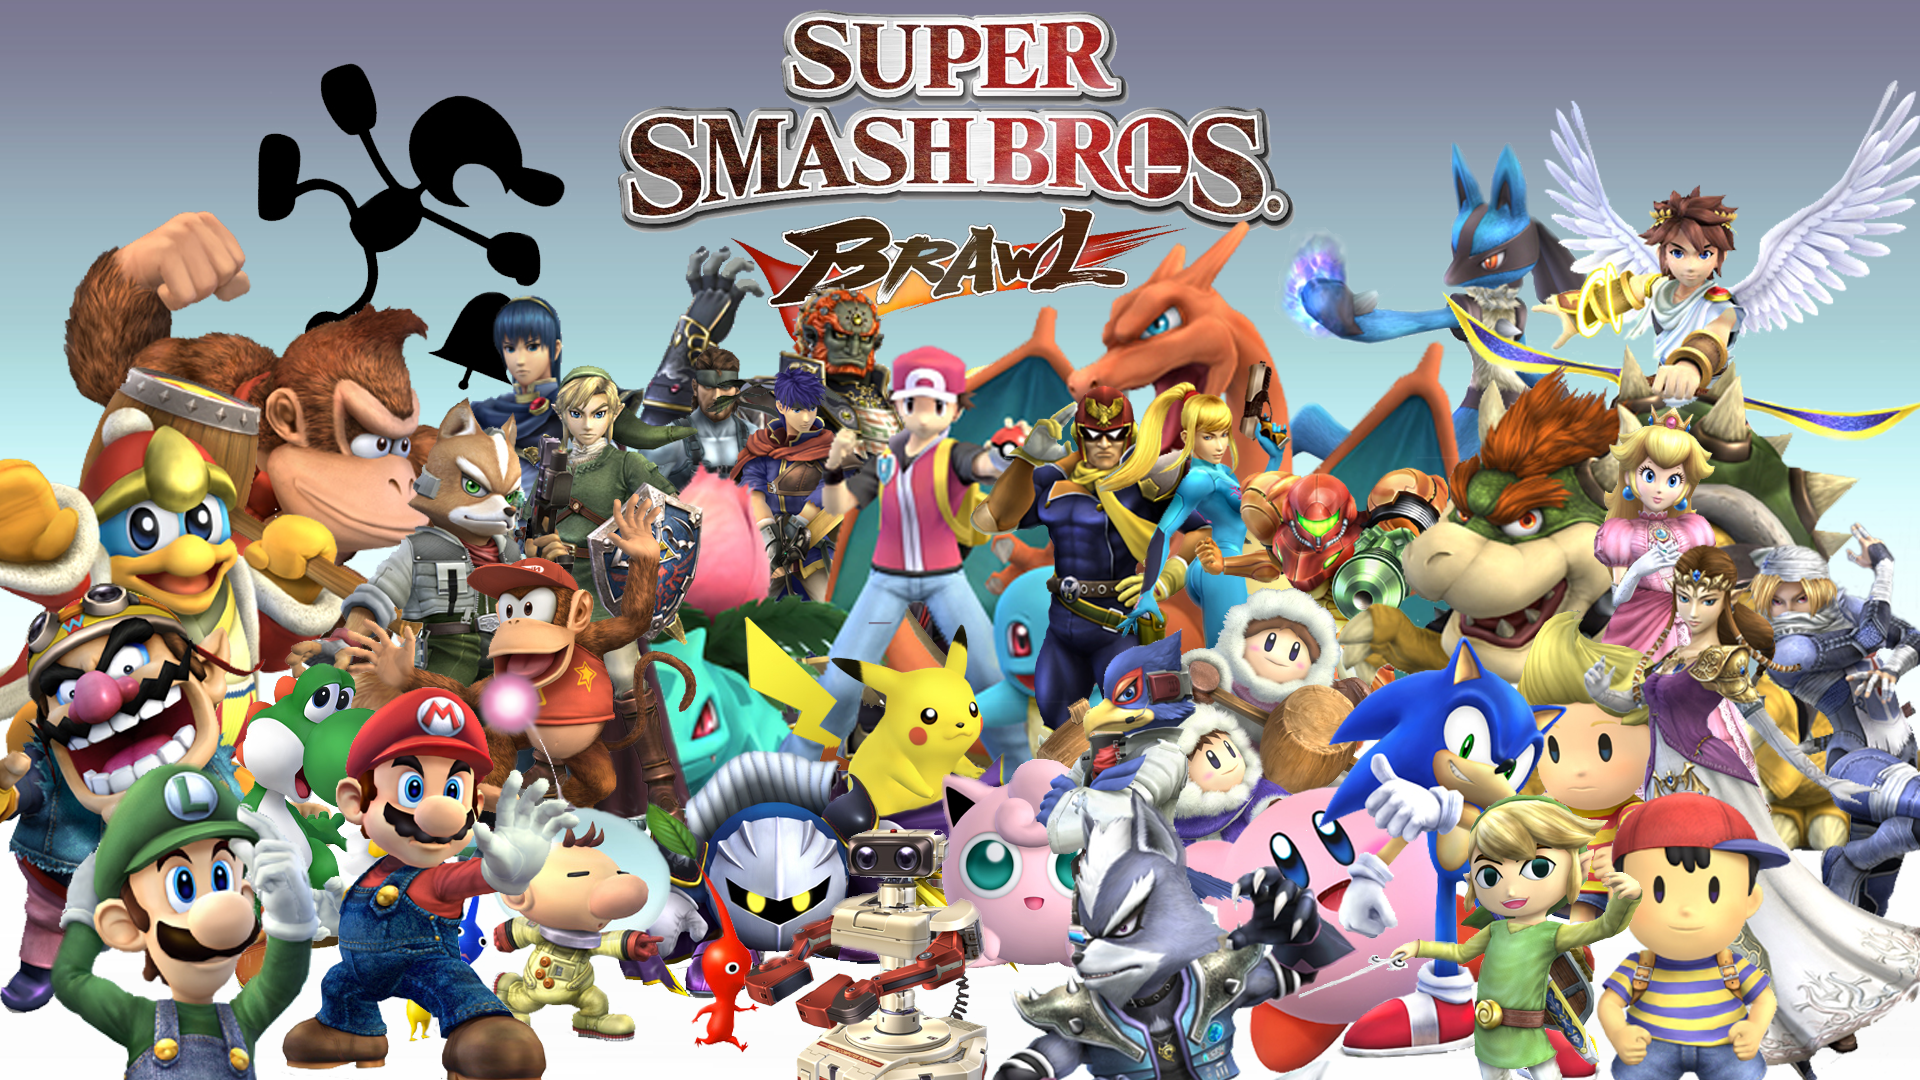 Super Smash Bros Wallpaper Widescreen